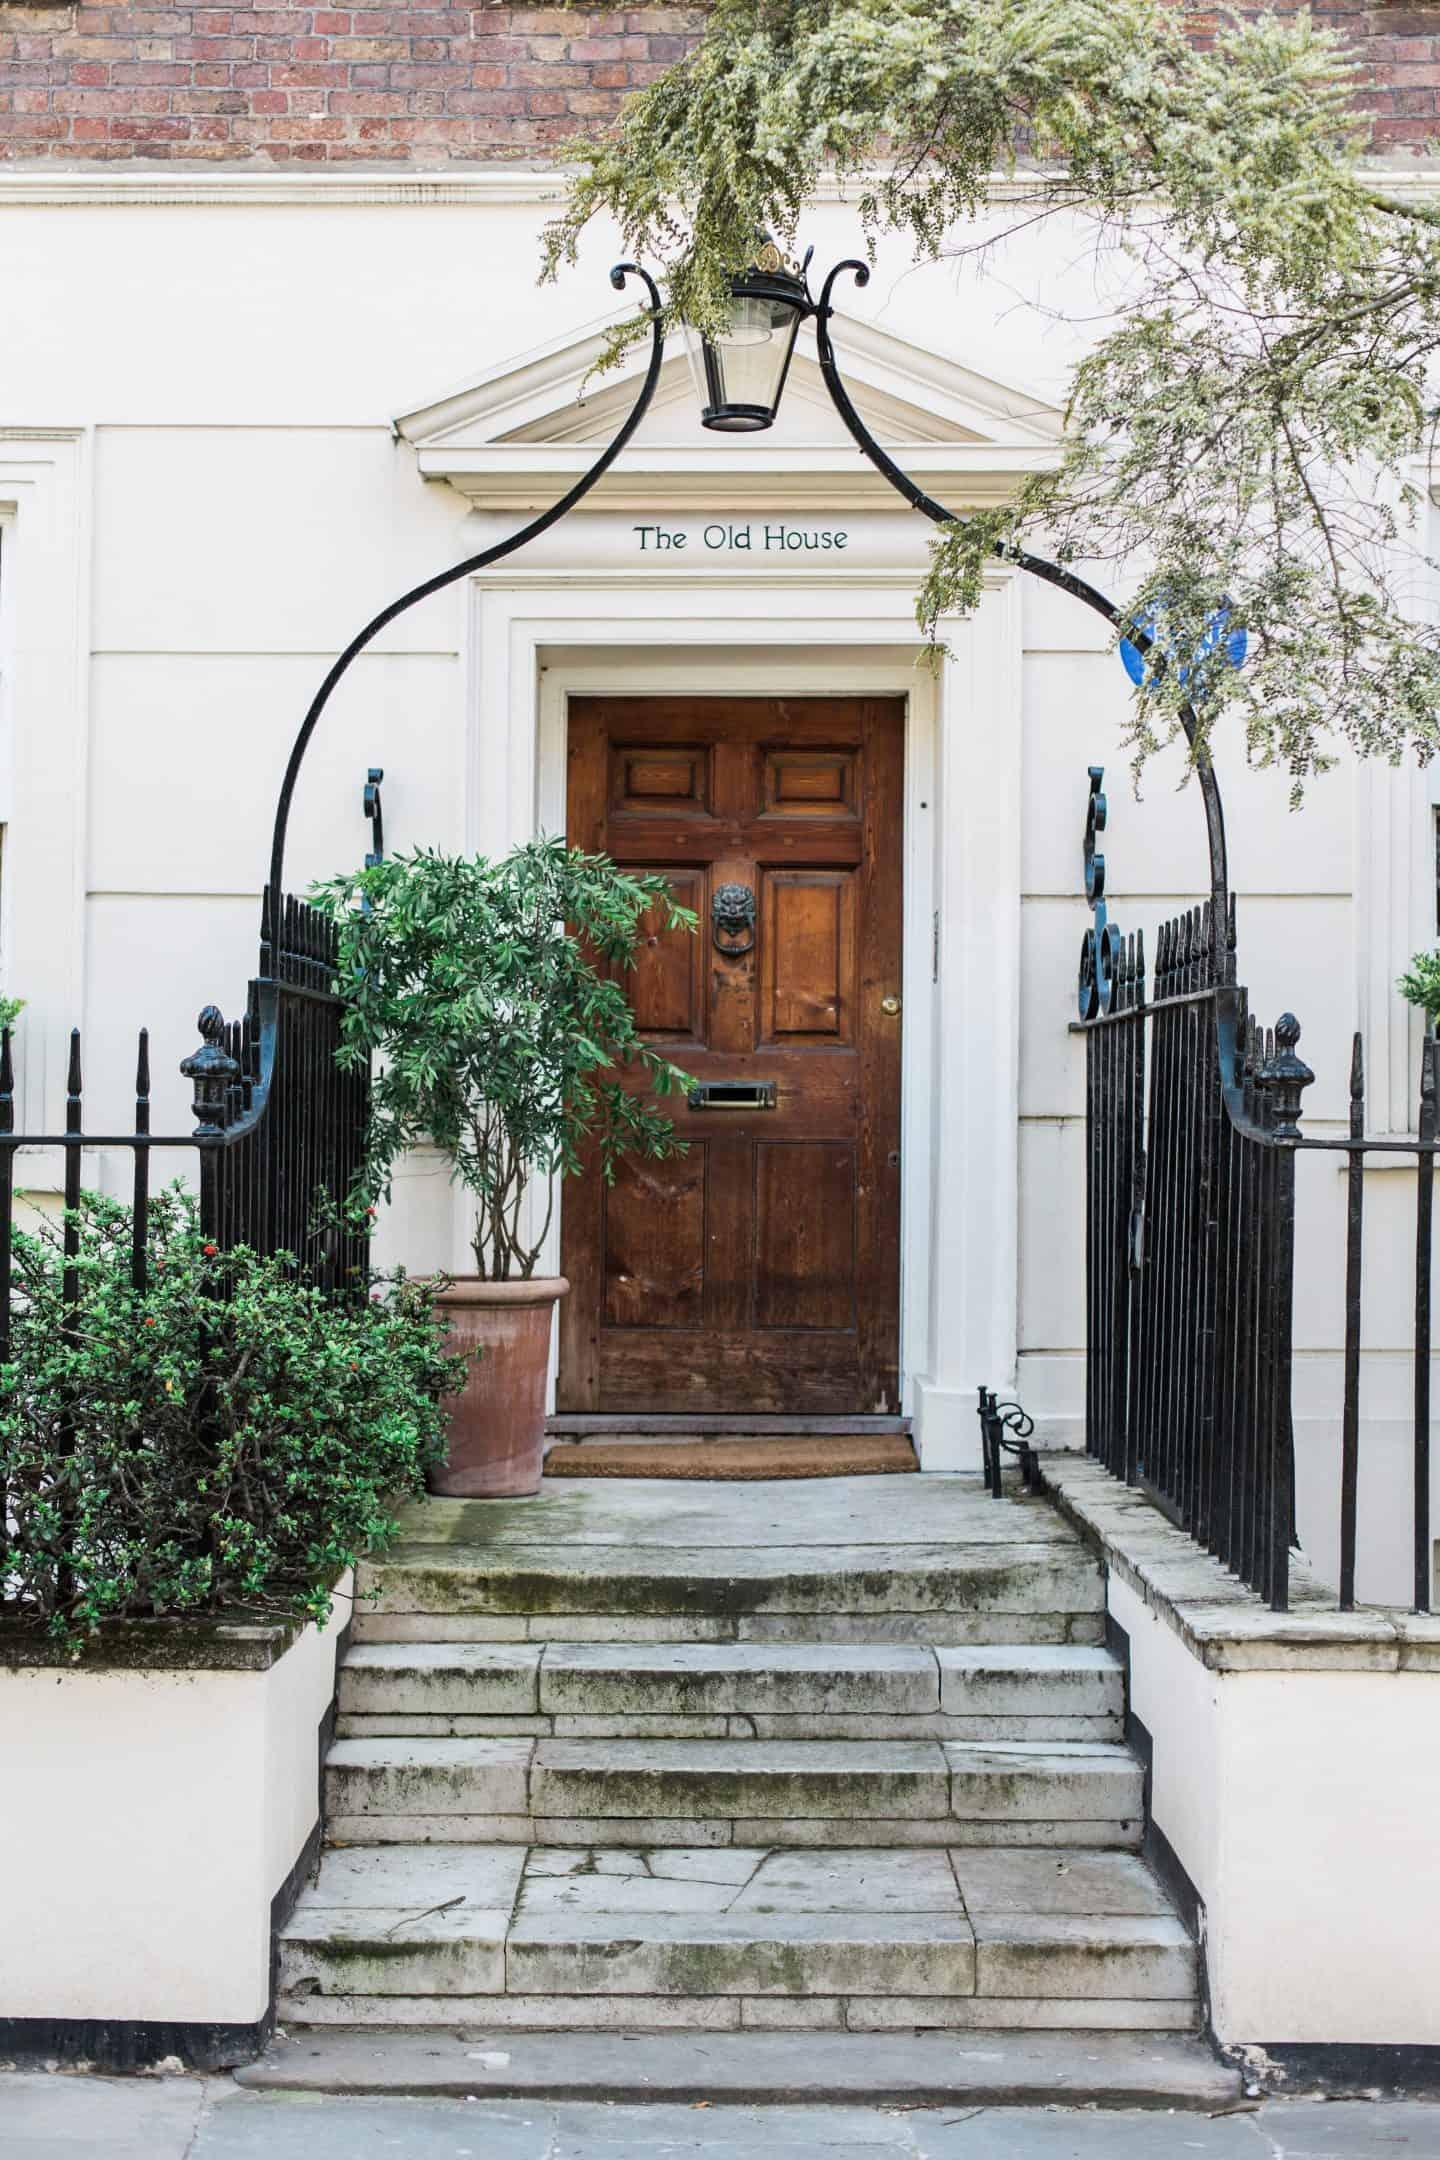 Kensington London Neighborhood Guide